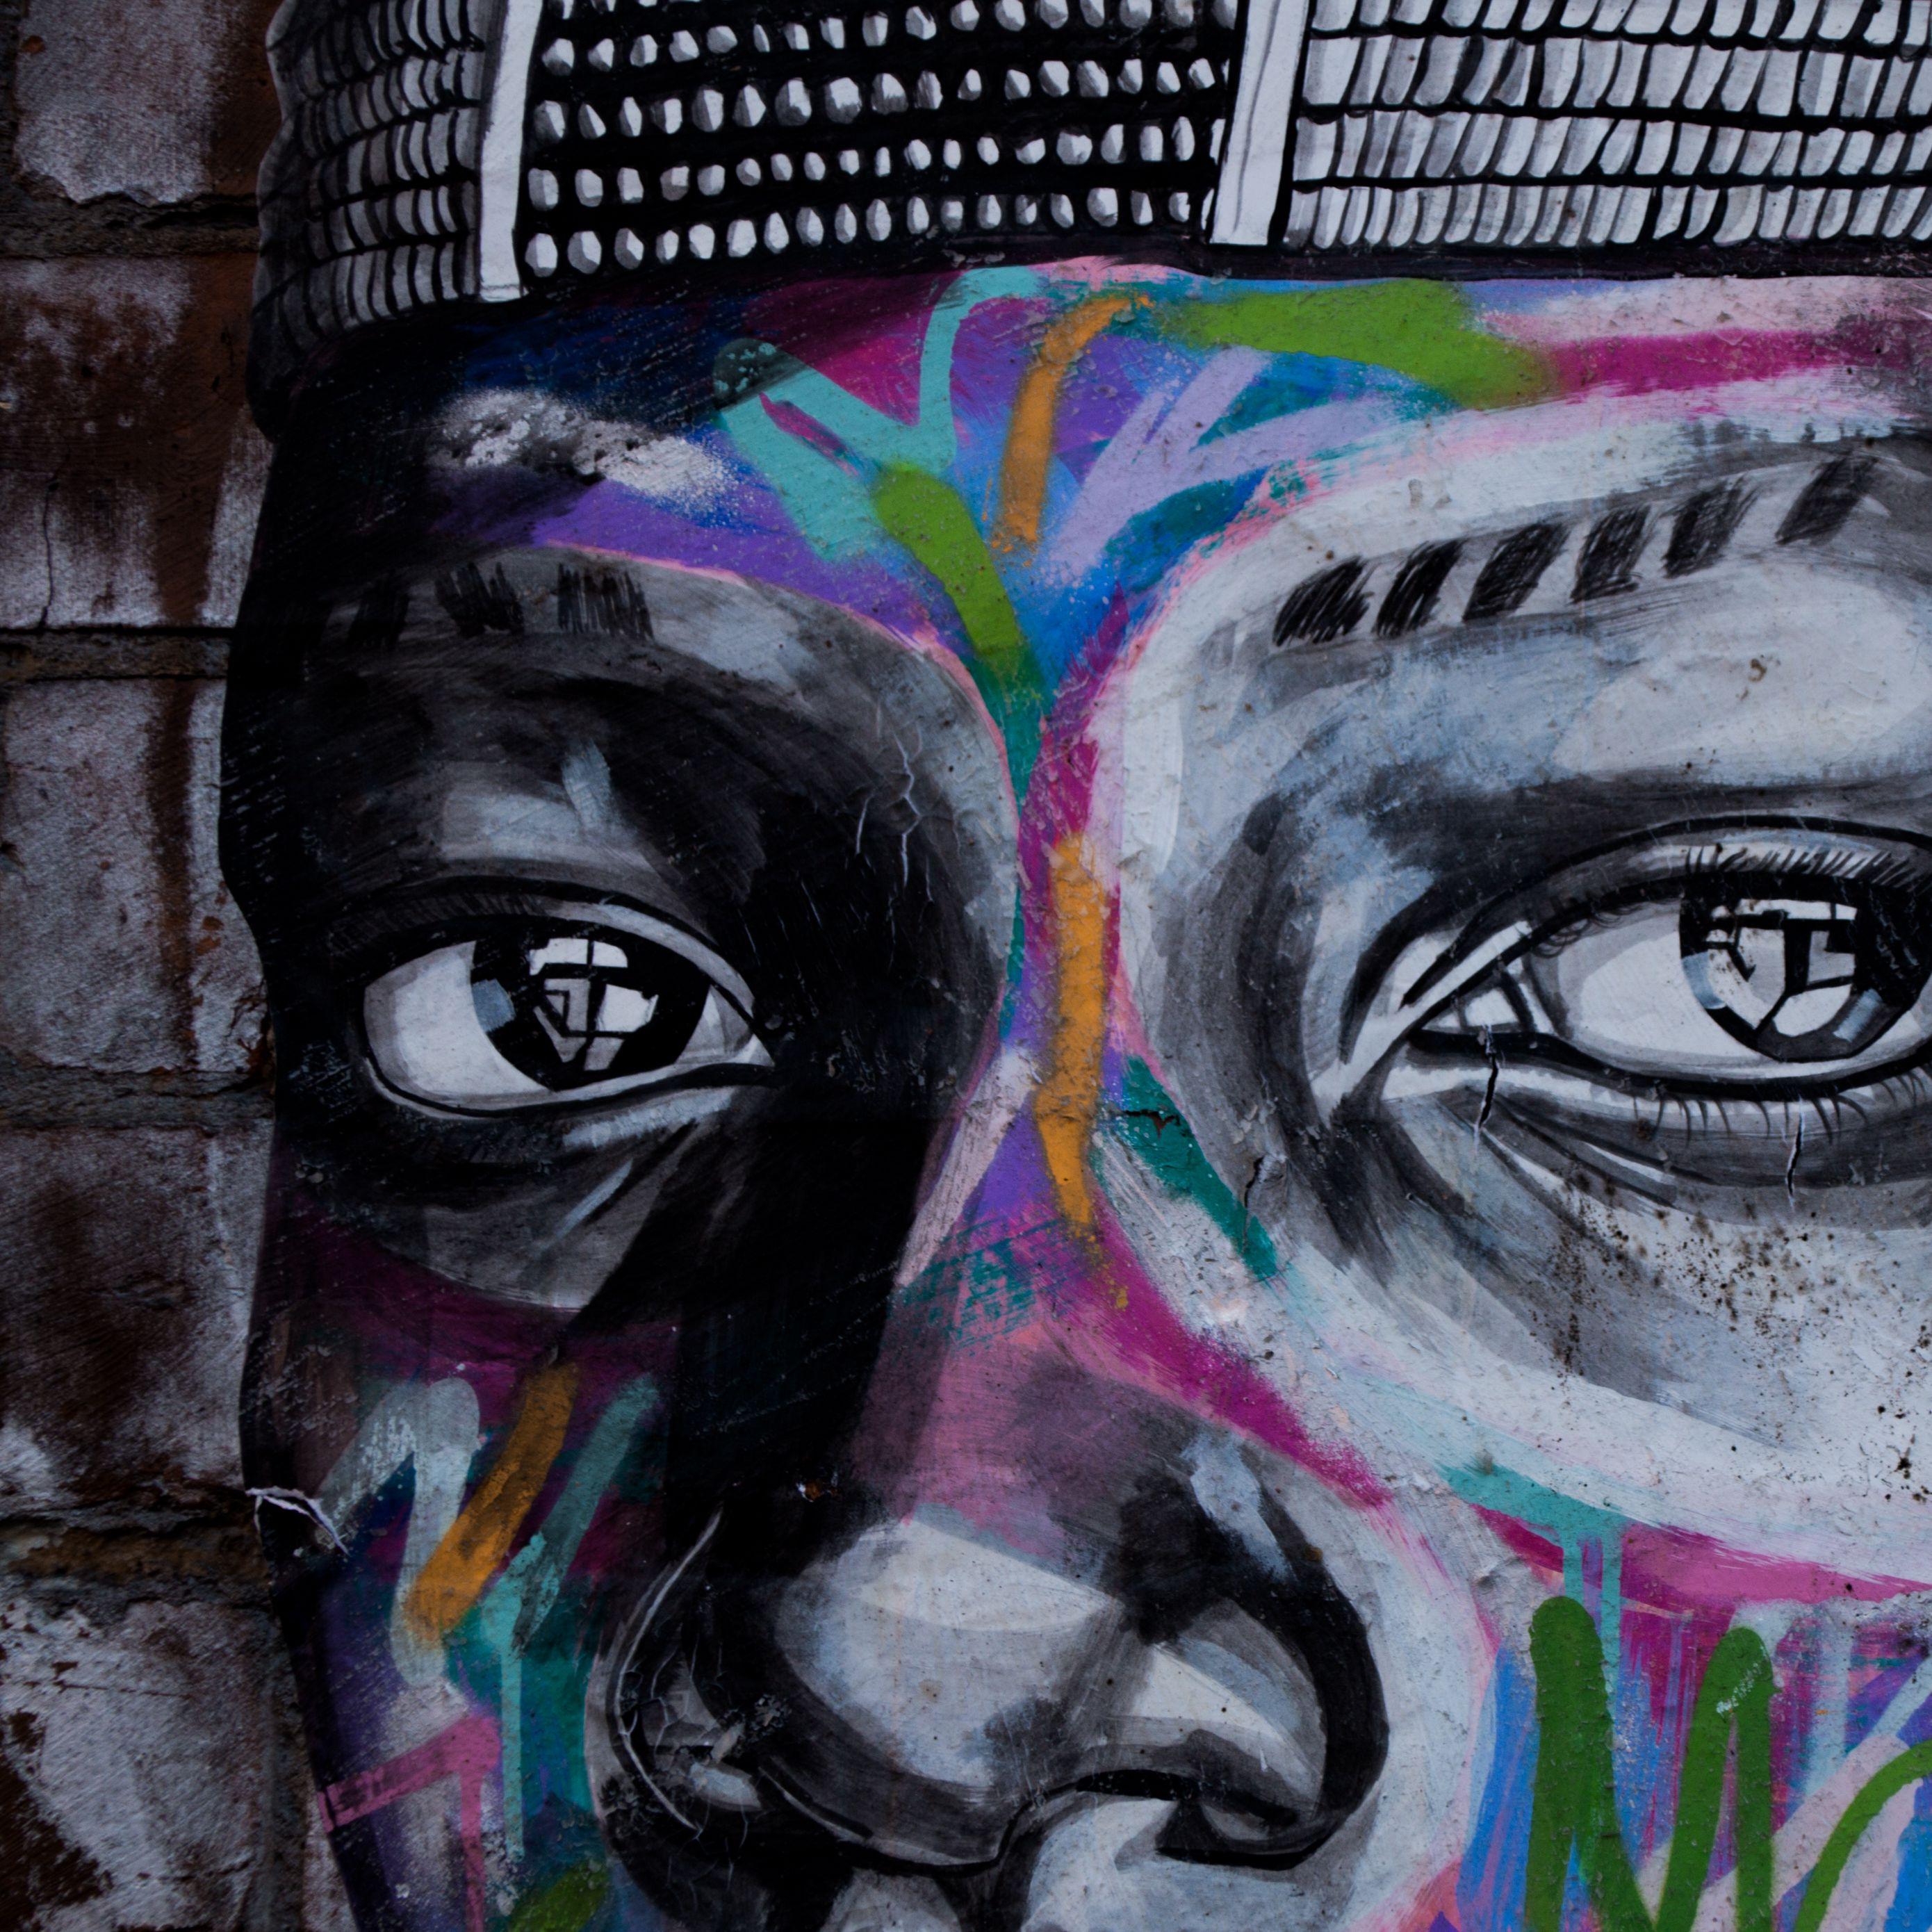 2780x2780 Wallpaper graffiti, eyes, art, street art